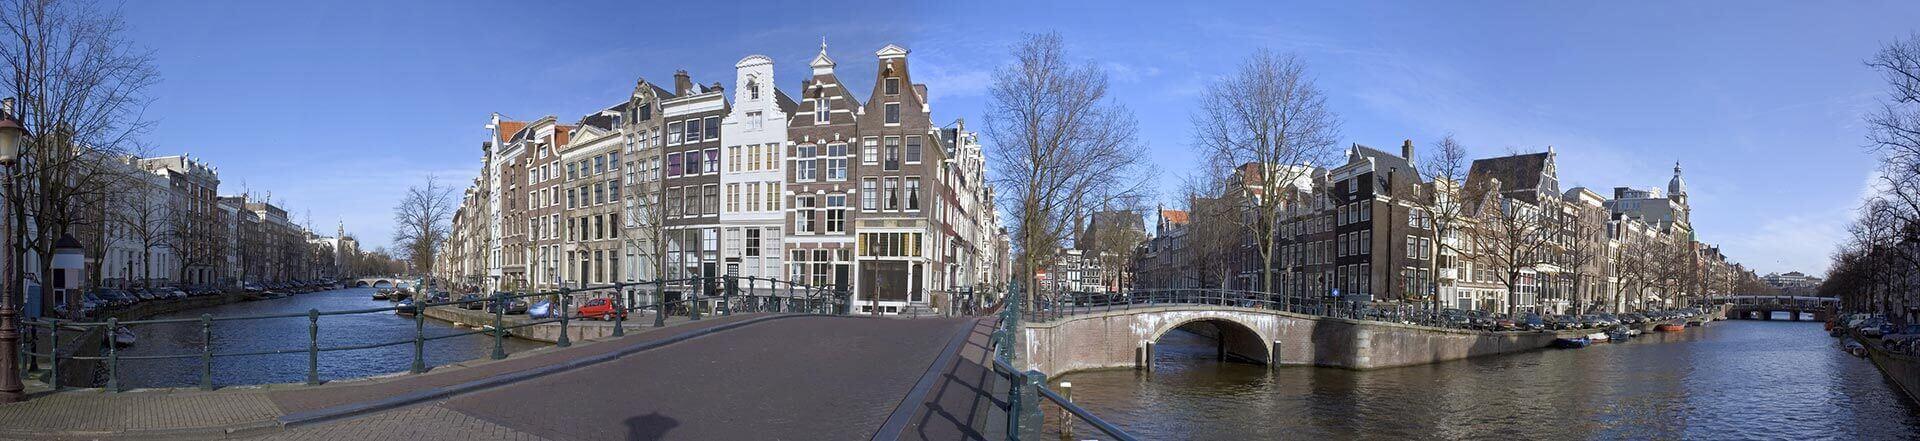 loonvordering salaris ambassade advocaat amsterdam